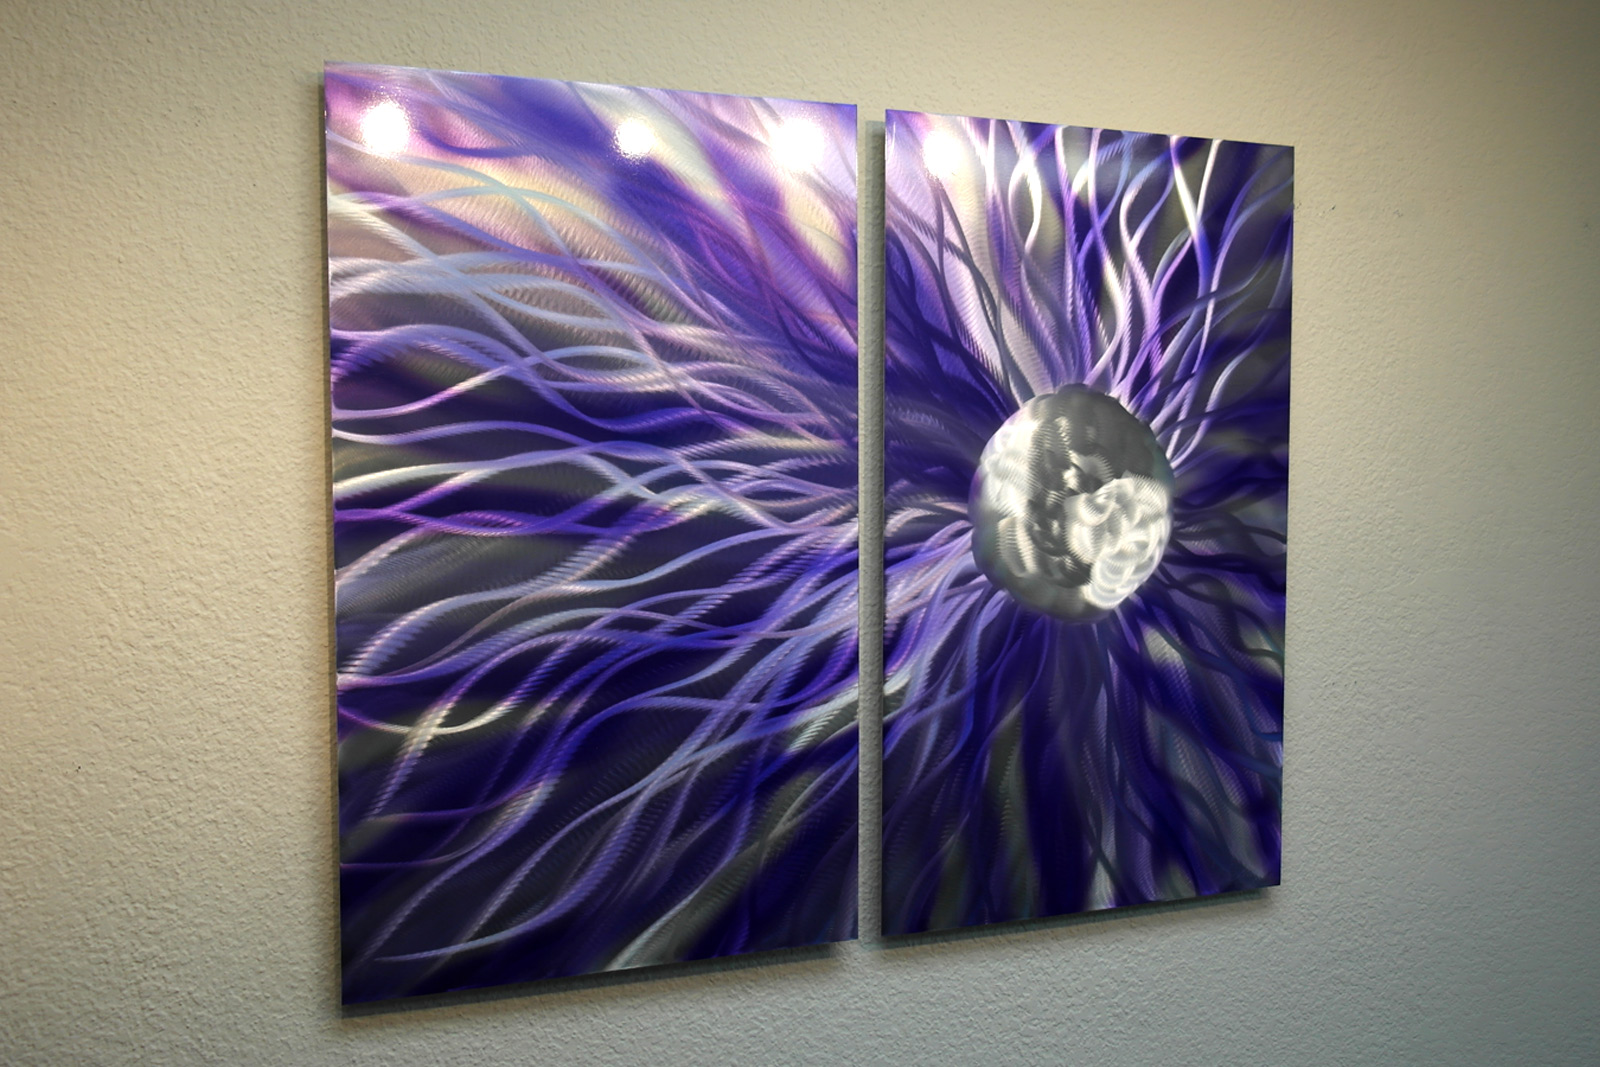 solare purple abstract metal wall art contemporary modern decor inspiring art gallery. Black Bedroom Furniture Sets. Home Design Ideas